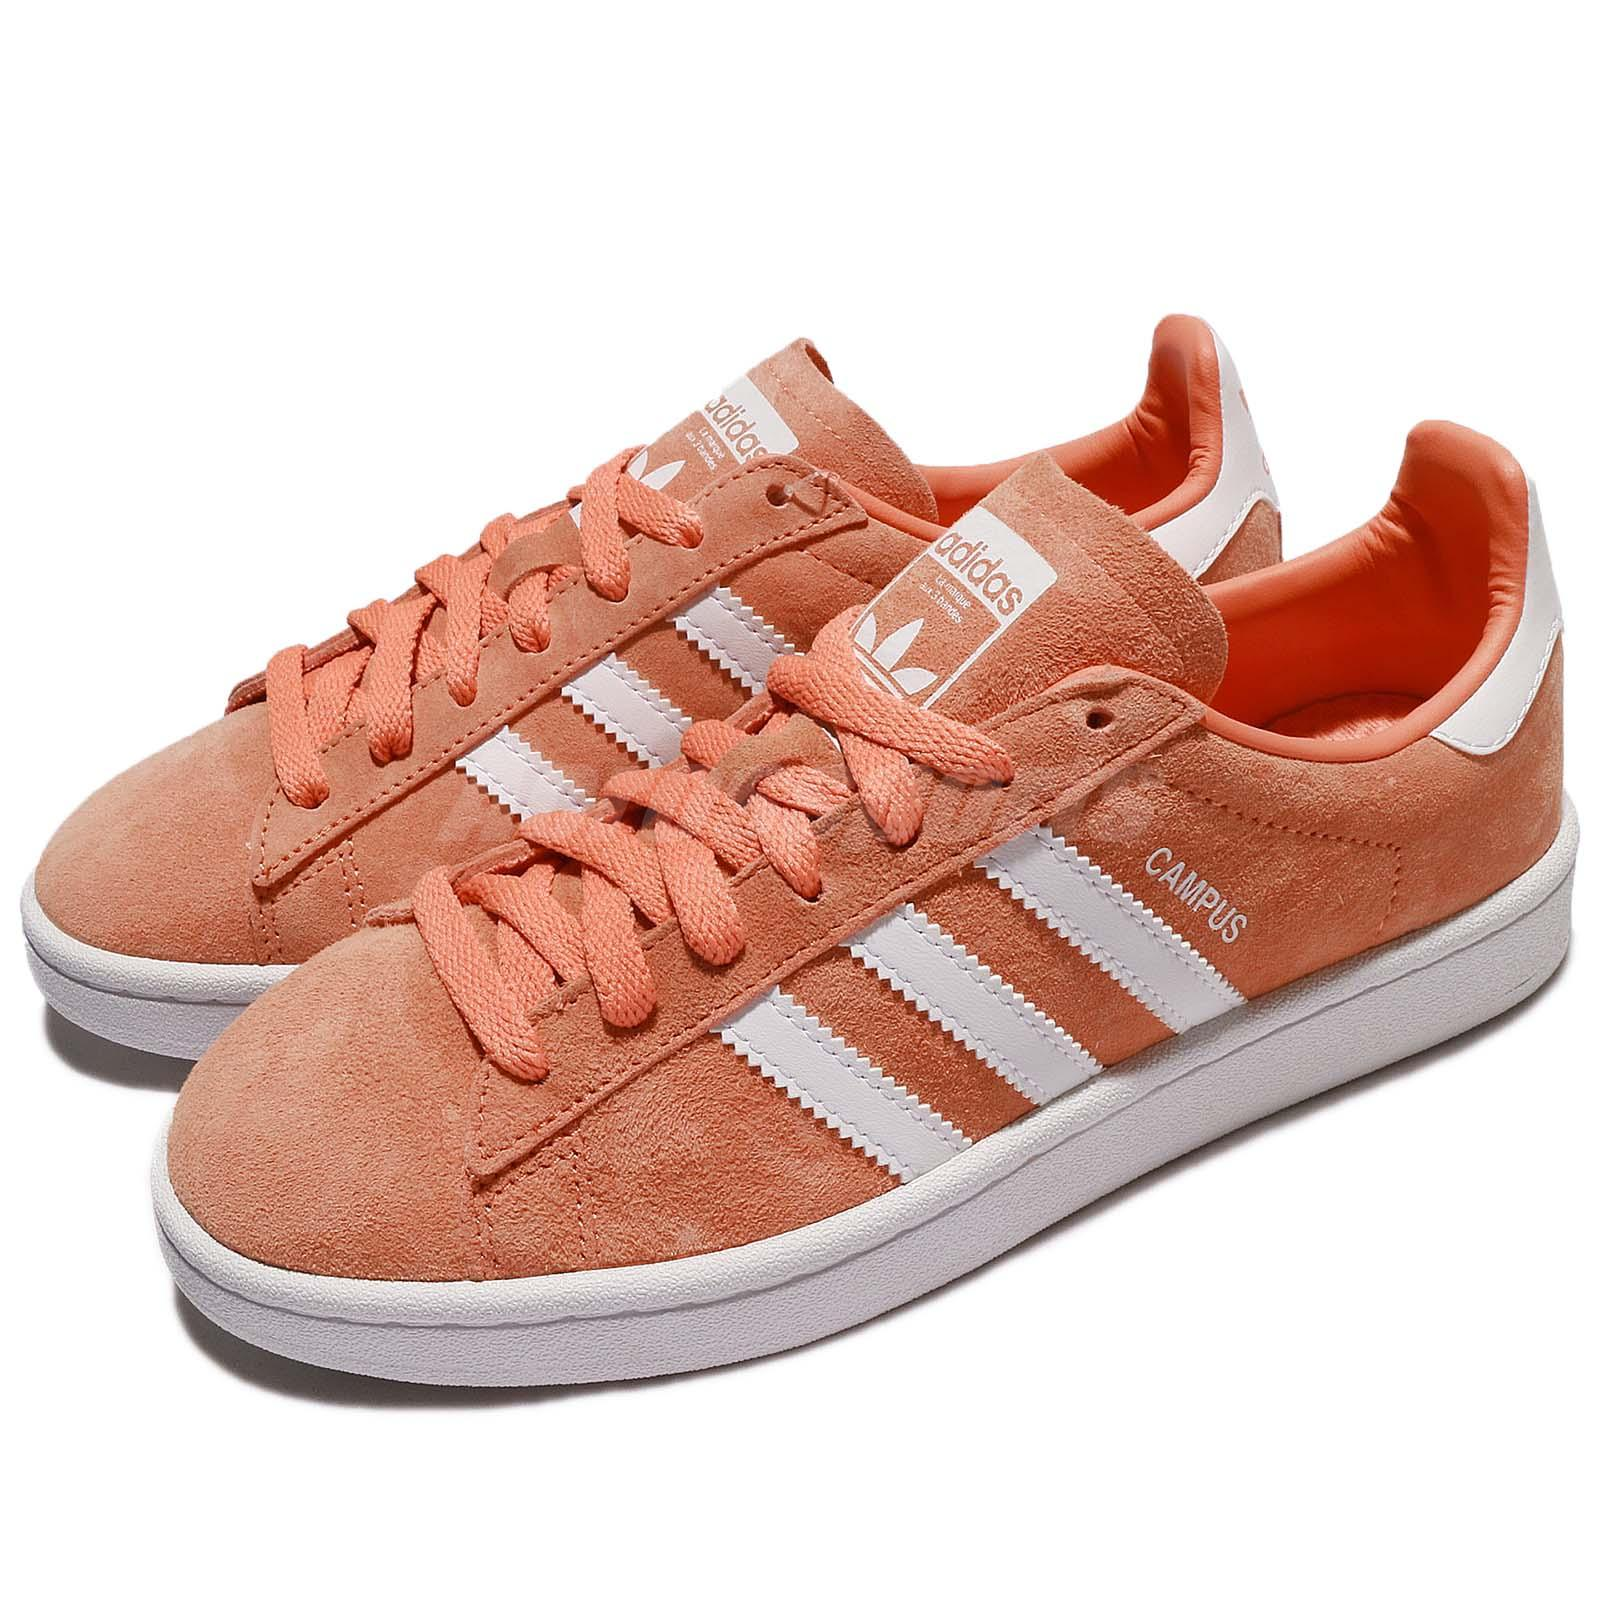 dc398883648a4c adidas Originals Campus Nubuck Orange White Men Women Shoes Sneakers ...